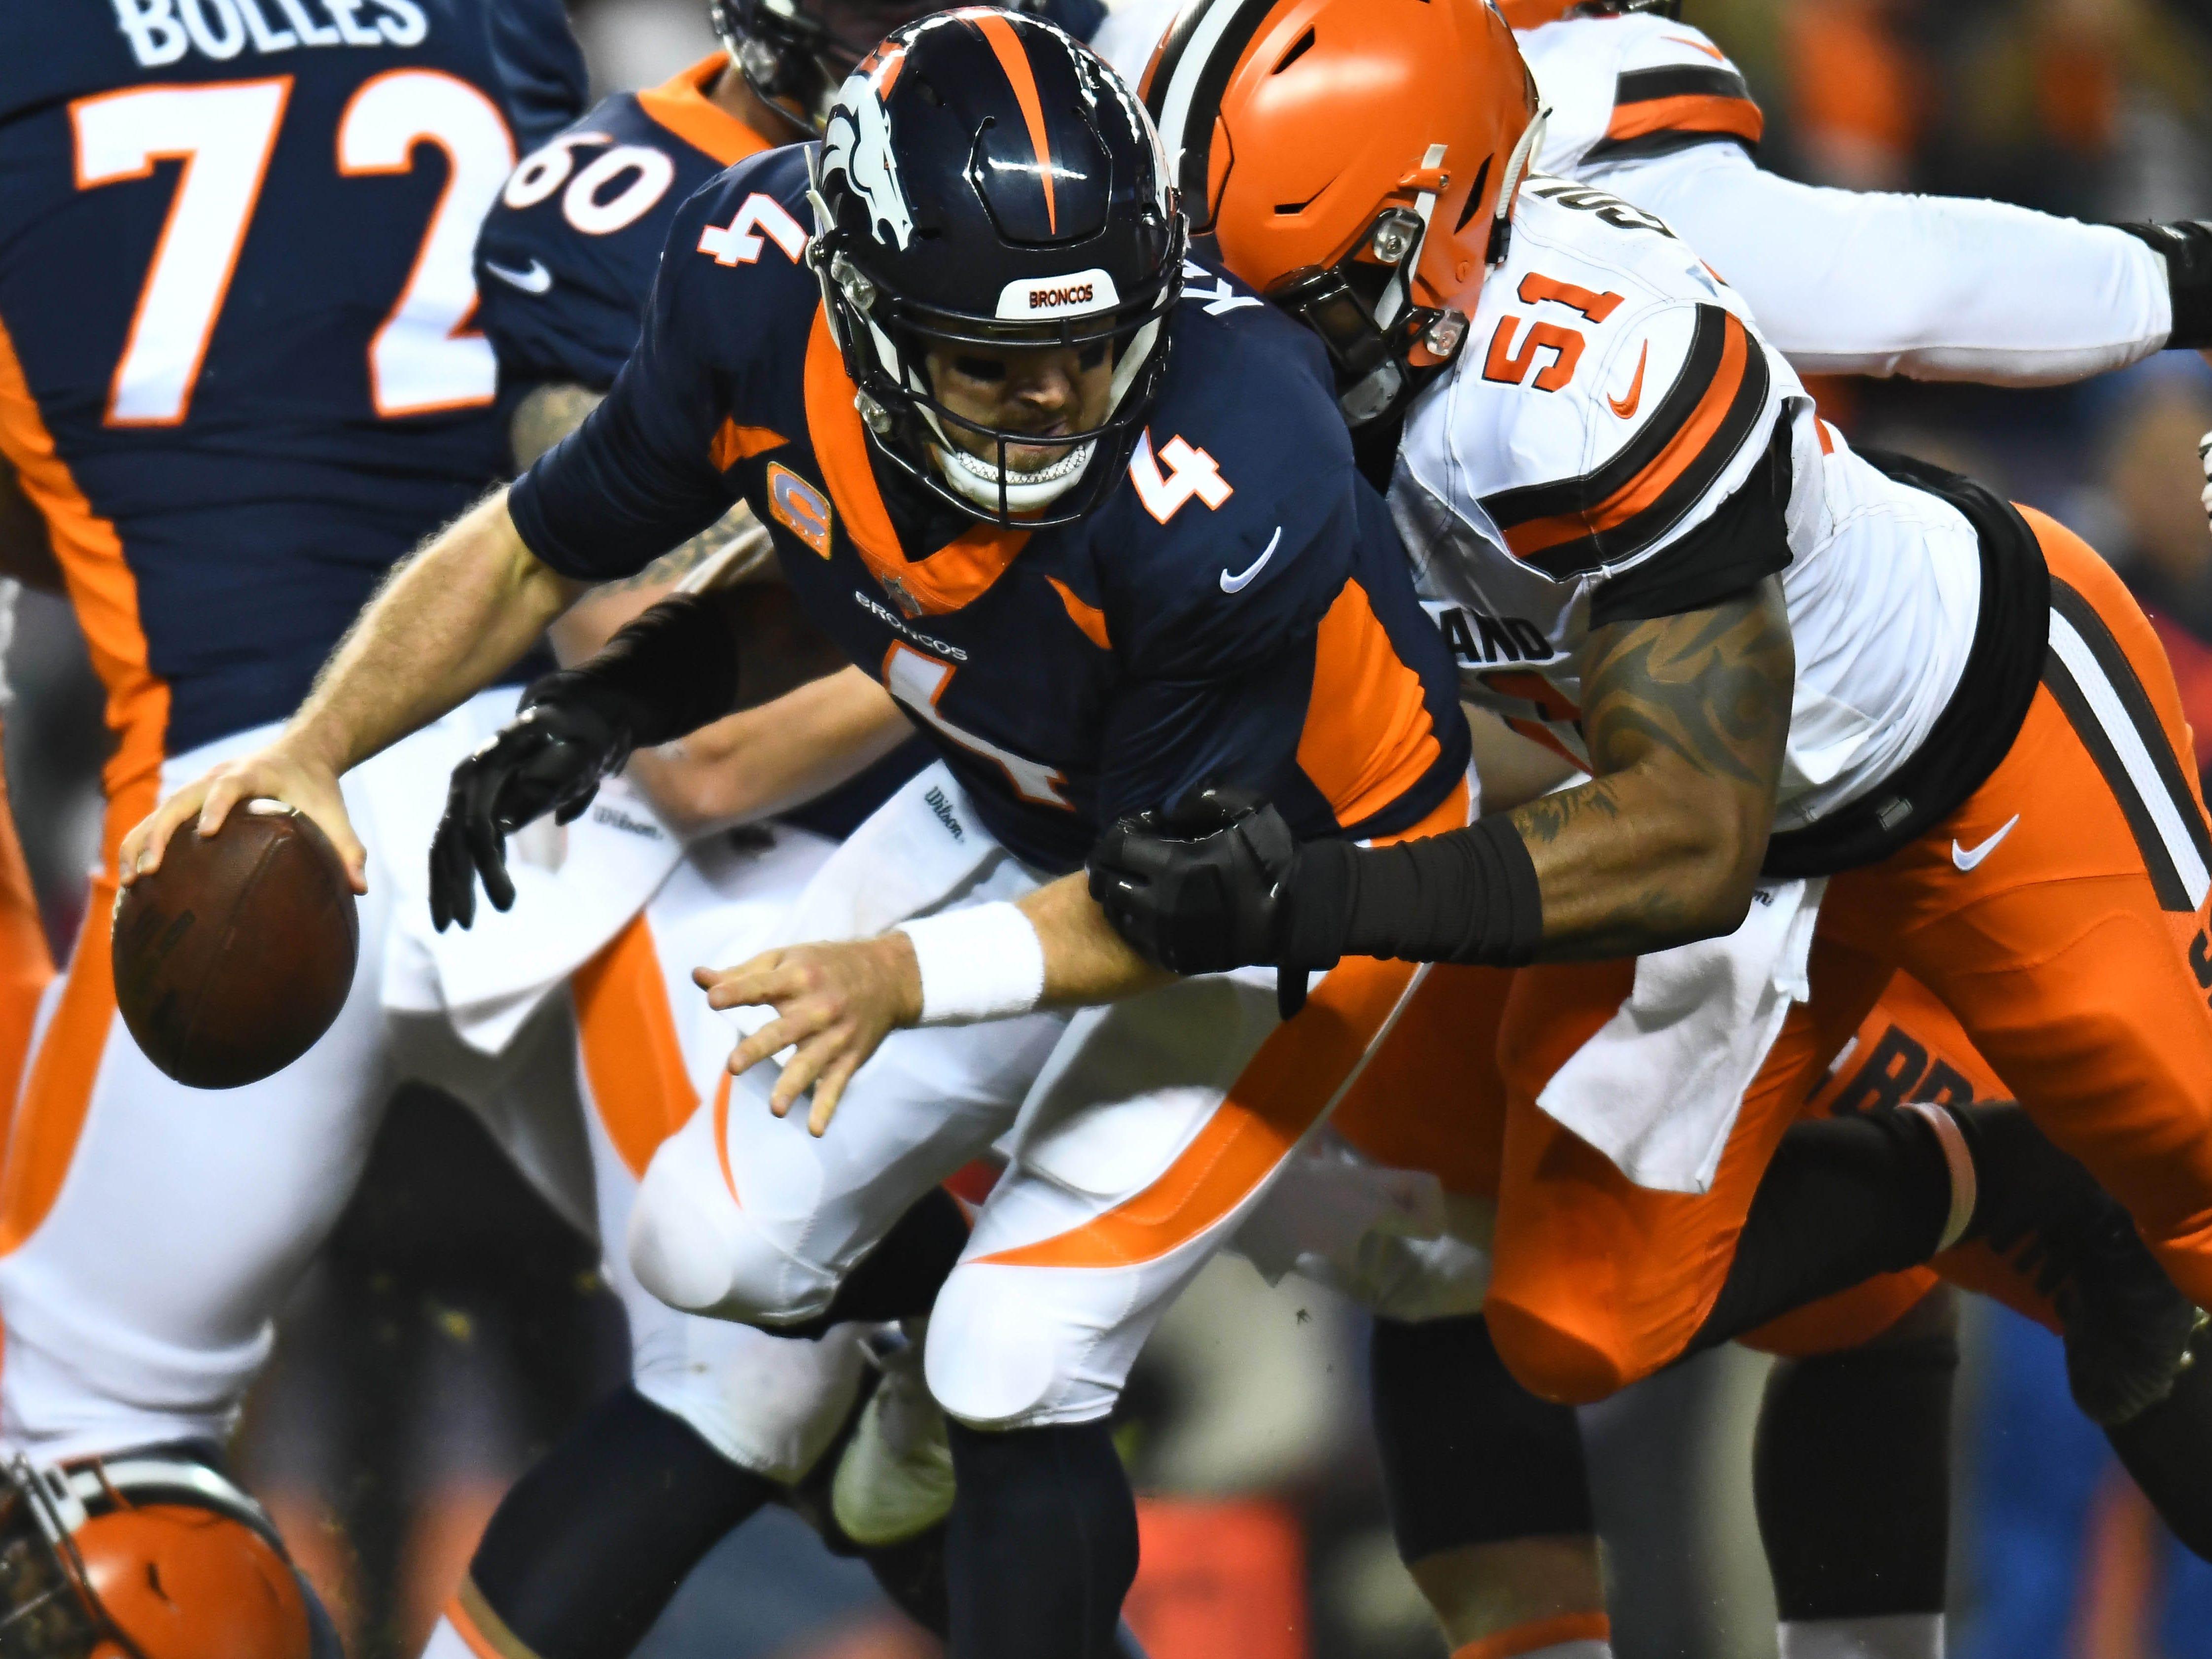 Dec 15, 2018; Denver, CO, USA; Cleveland Browns outside linebacker Jamie Collins (51) sacks Denver Broncos quarterback Case Keenum (4) in the first quarter at Broncos Stadium at Mile High. Mandatory Credit: Ron Chenoy-USA TODAY Sports ORG XMIT: USATSI-381591 ORIG FILE ID:  20181215_sal_ac4_1828.JPG